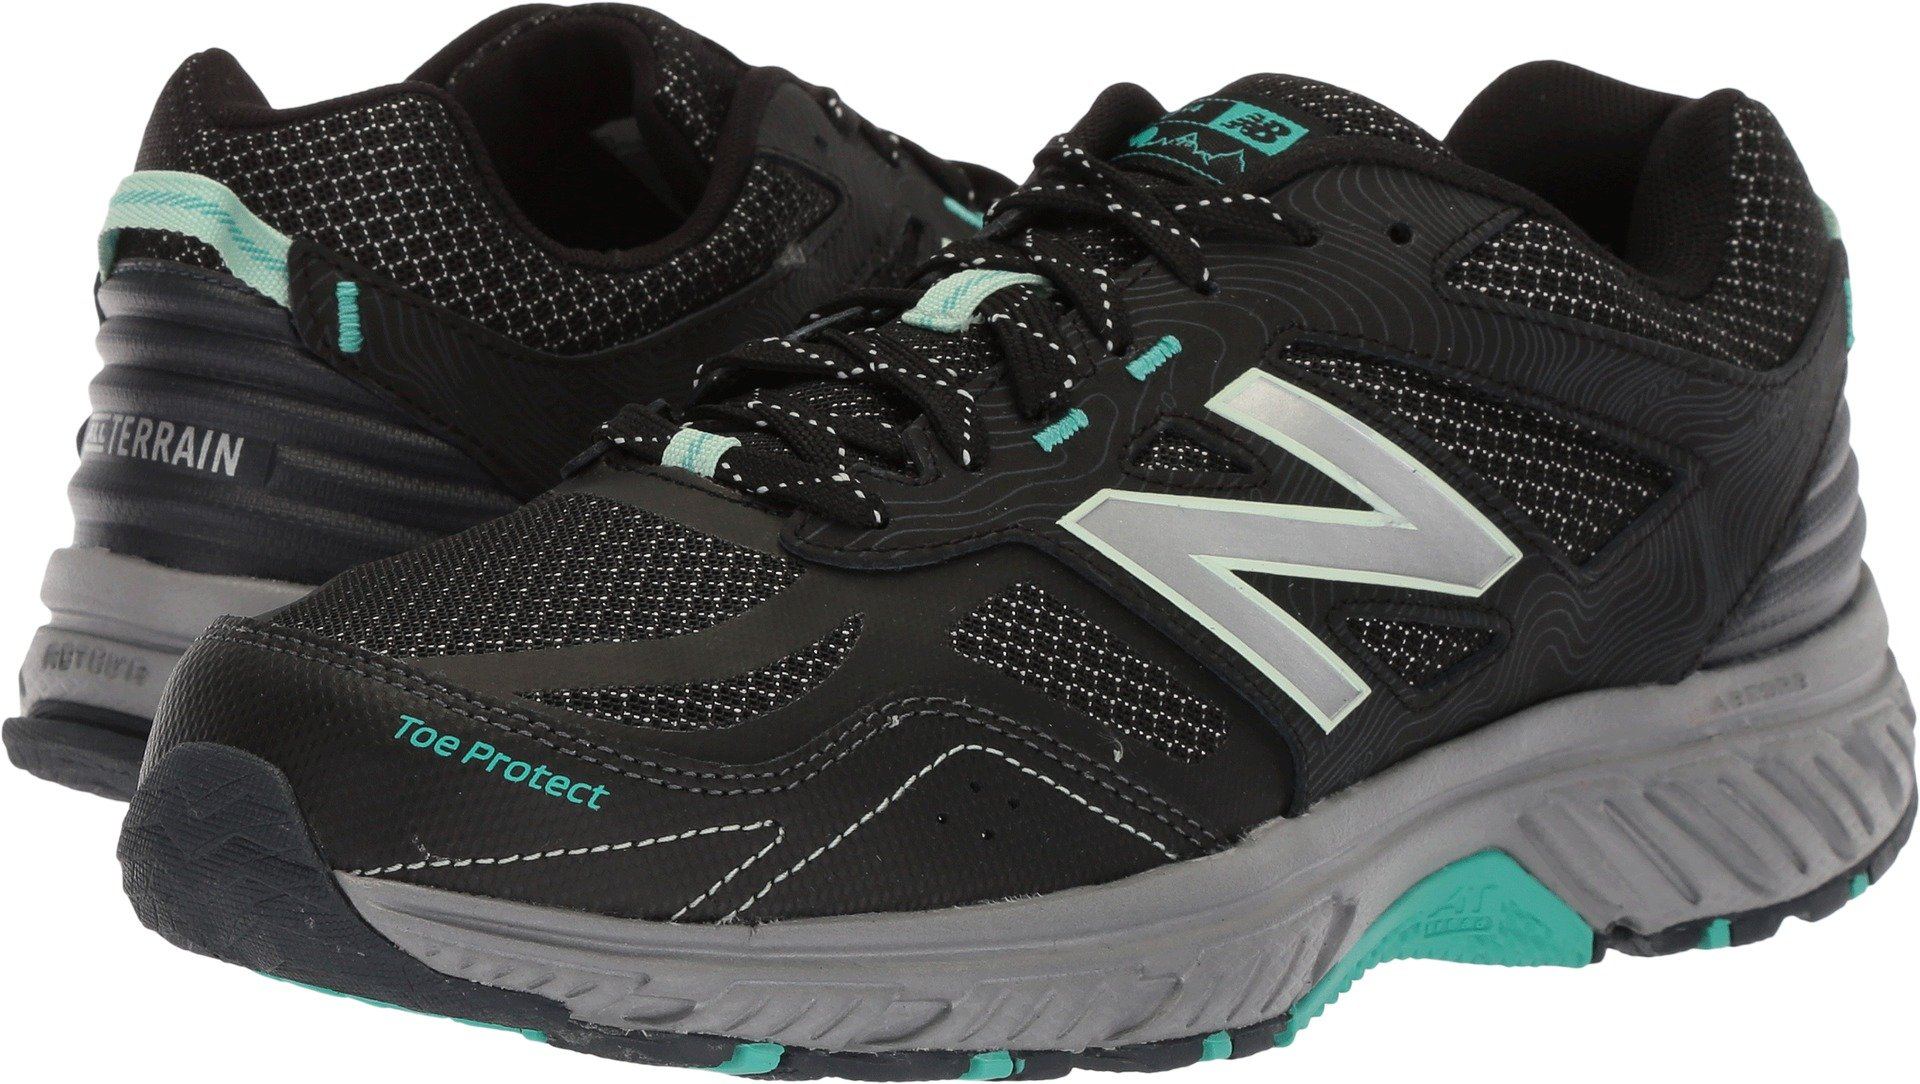 New Balance Women's 510v4 Cushioning Trail Running Shoe, Black, 8.5 D US